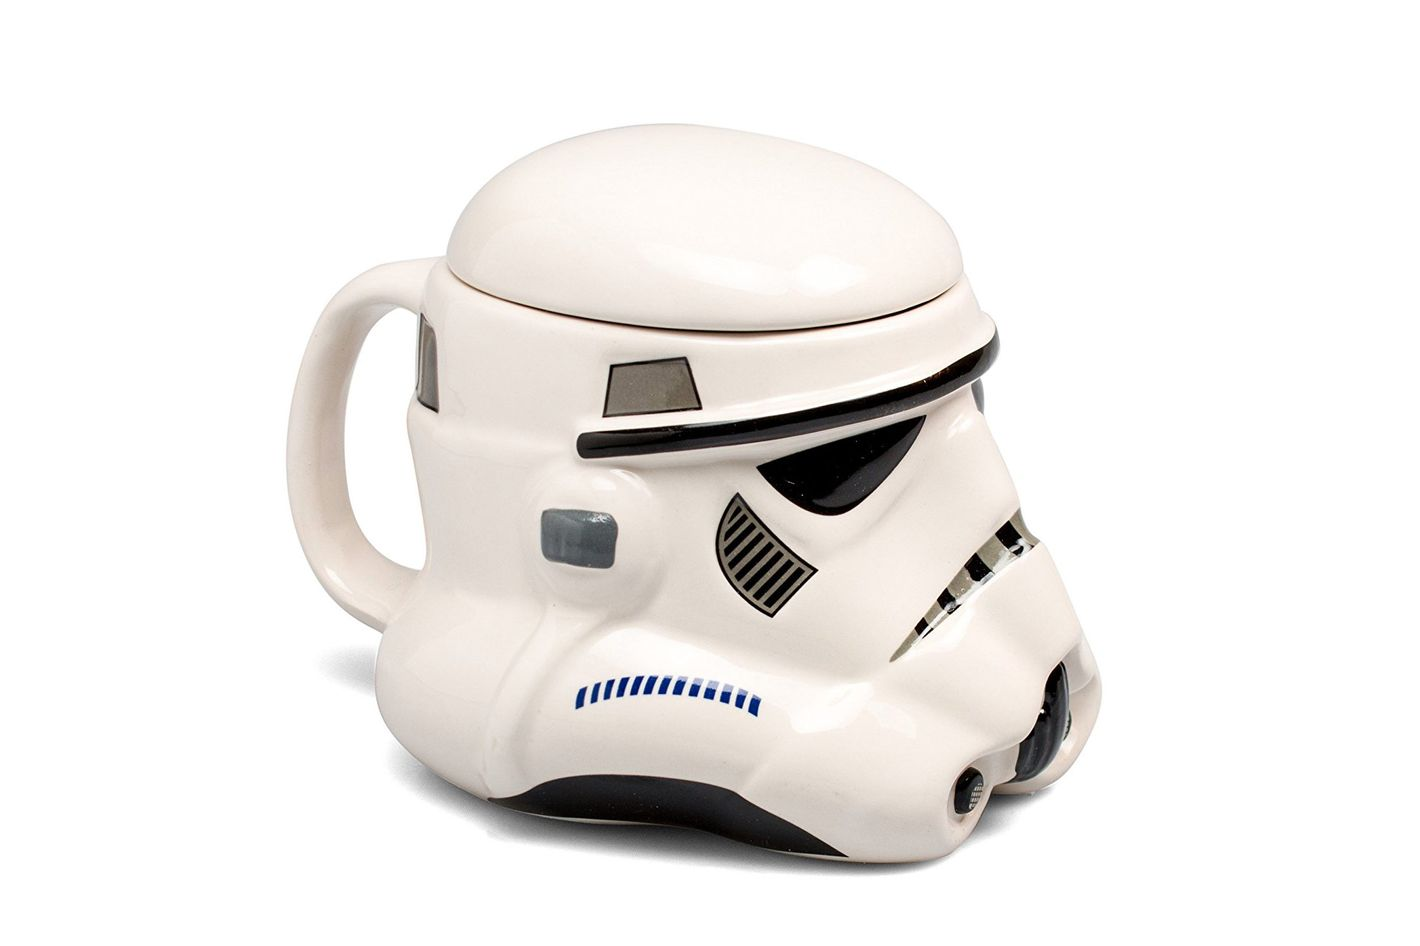 Star Wars Mug — Stormtrooper Helmet 3D Ceramic Coffee Mug With Removable Lid